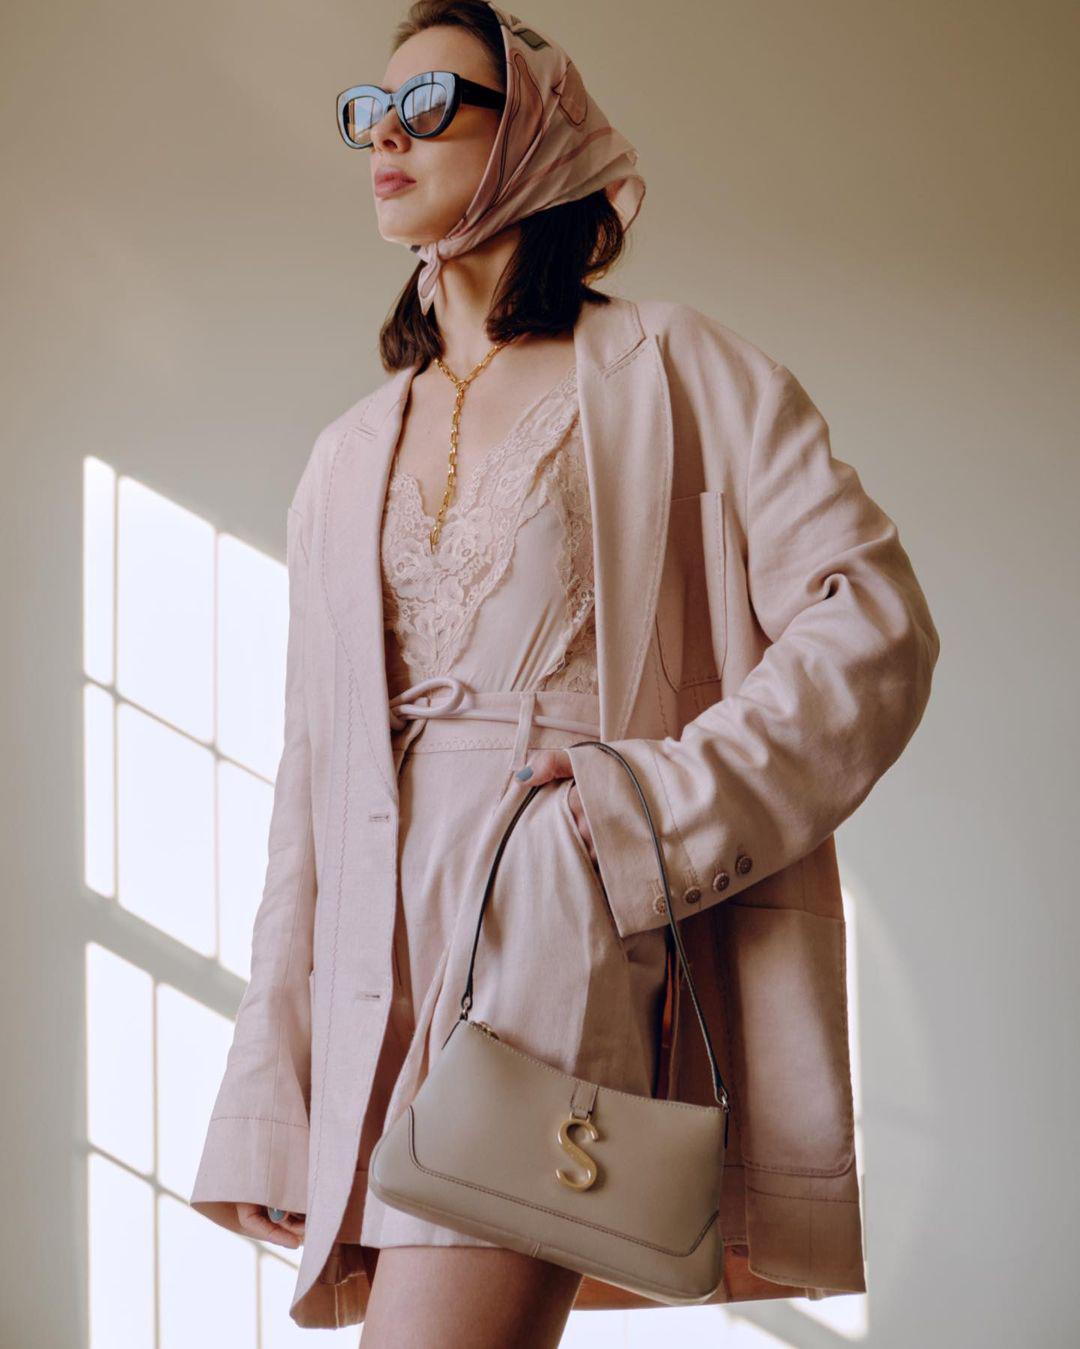 Marina Ingvarsson wears the Luminous Duster Jacket, Botanica Teddy and the Luminous Long Line Short